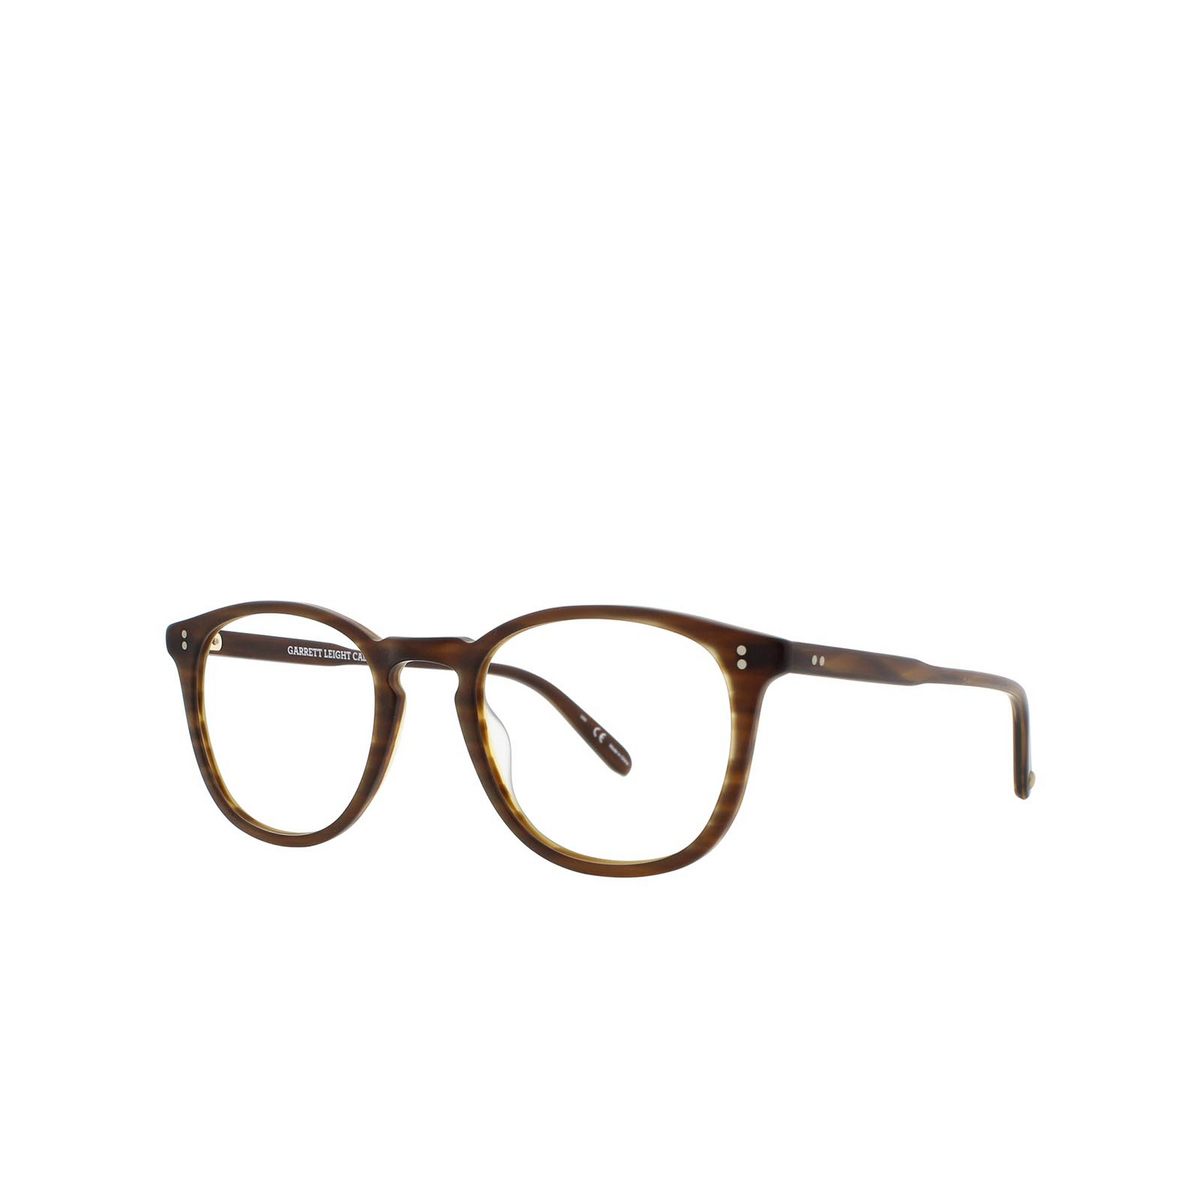 Garrett Leight® Square Eyeglasses: Kinney color Matte Brandy Tort Mbt - three-quarters view.